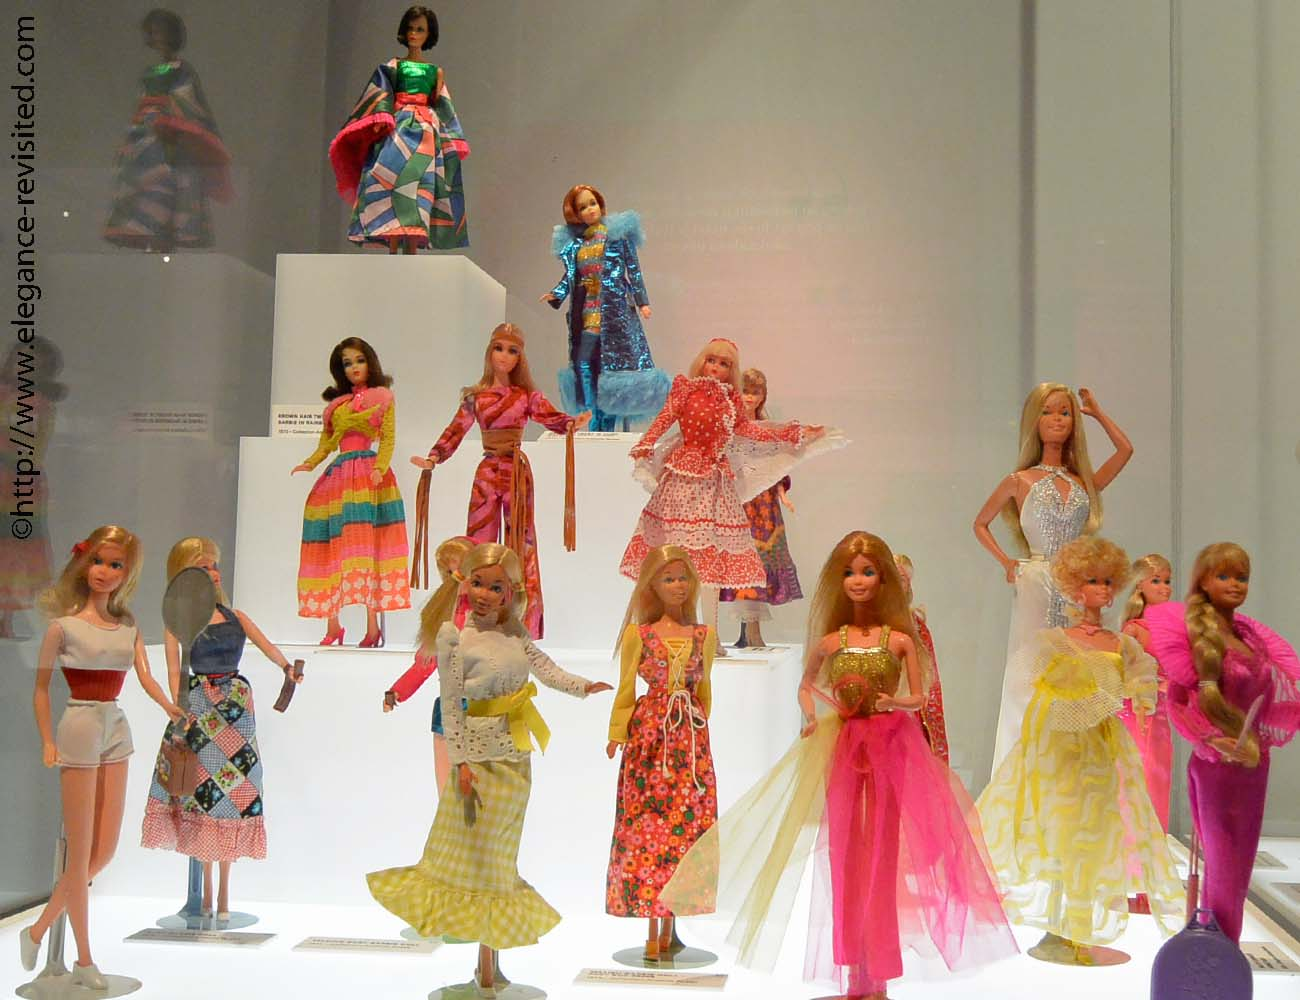 Barbie1970s